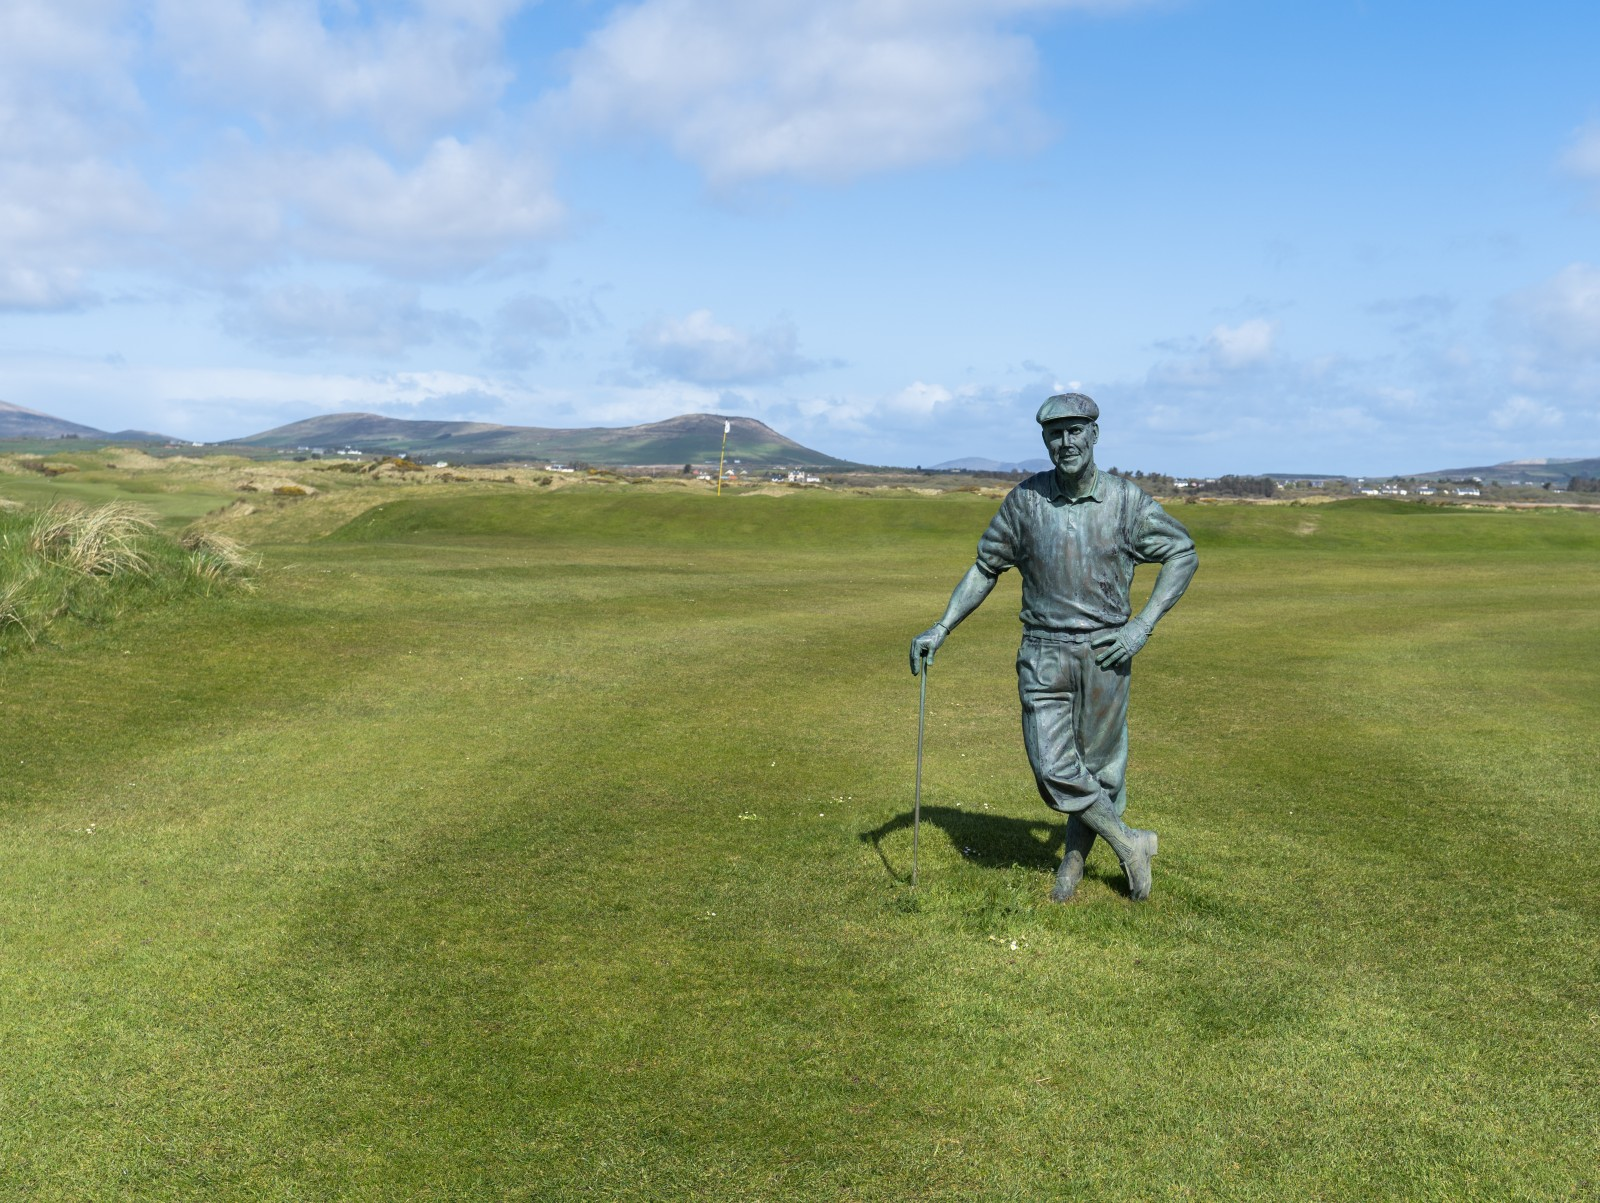 Erinnerung an Payne Stewart im Waterville Golf Links